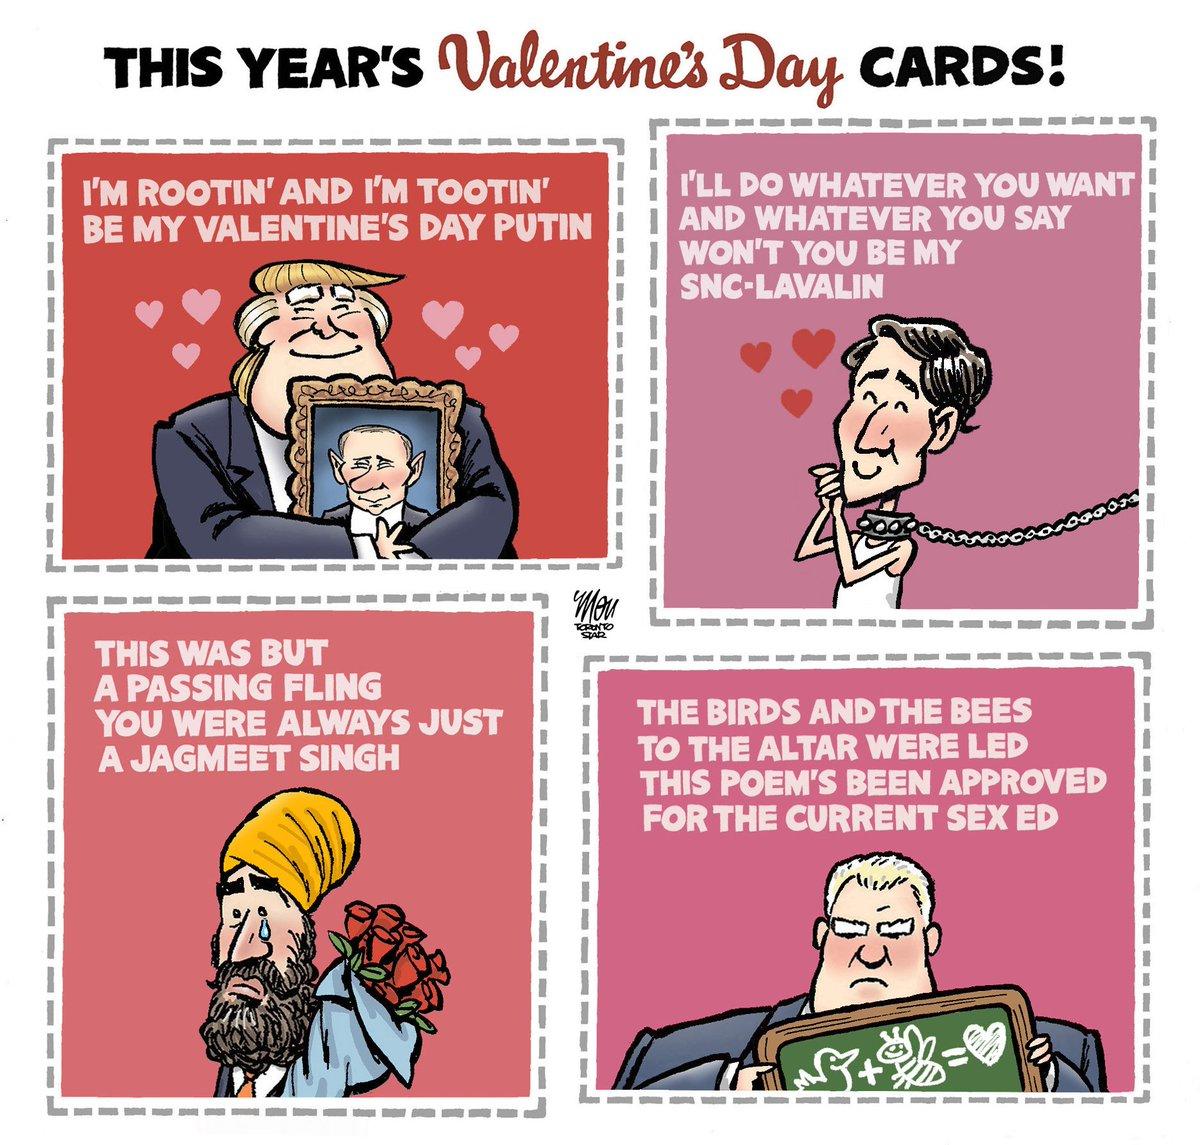 Here's Thursday's #ValentinesDay cartoon in @TorontoStar